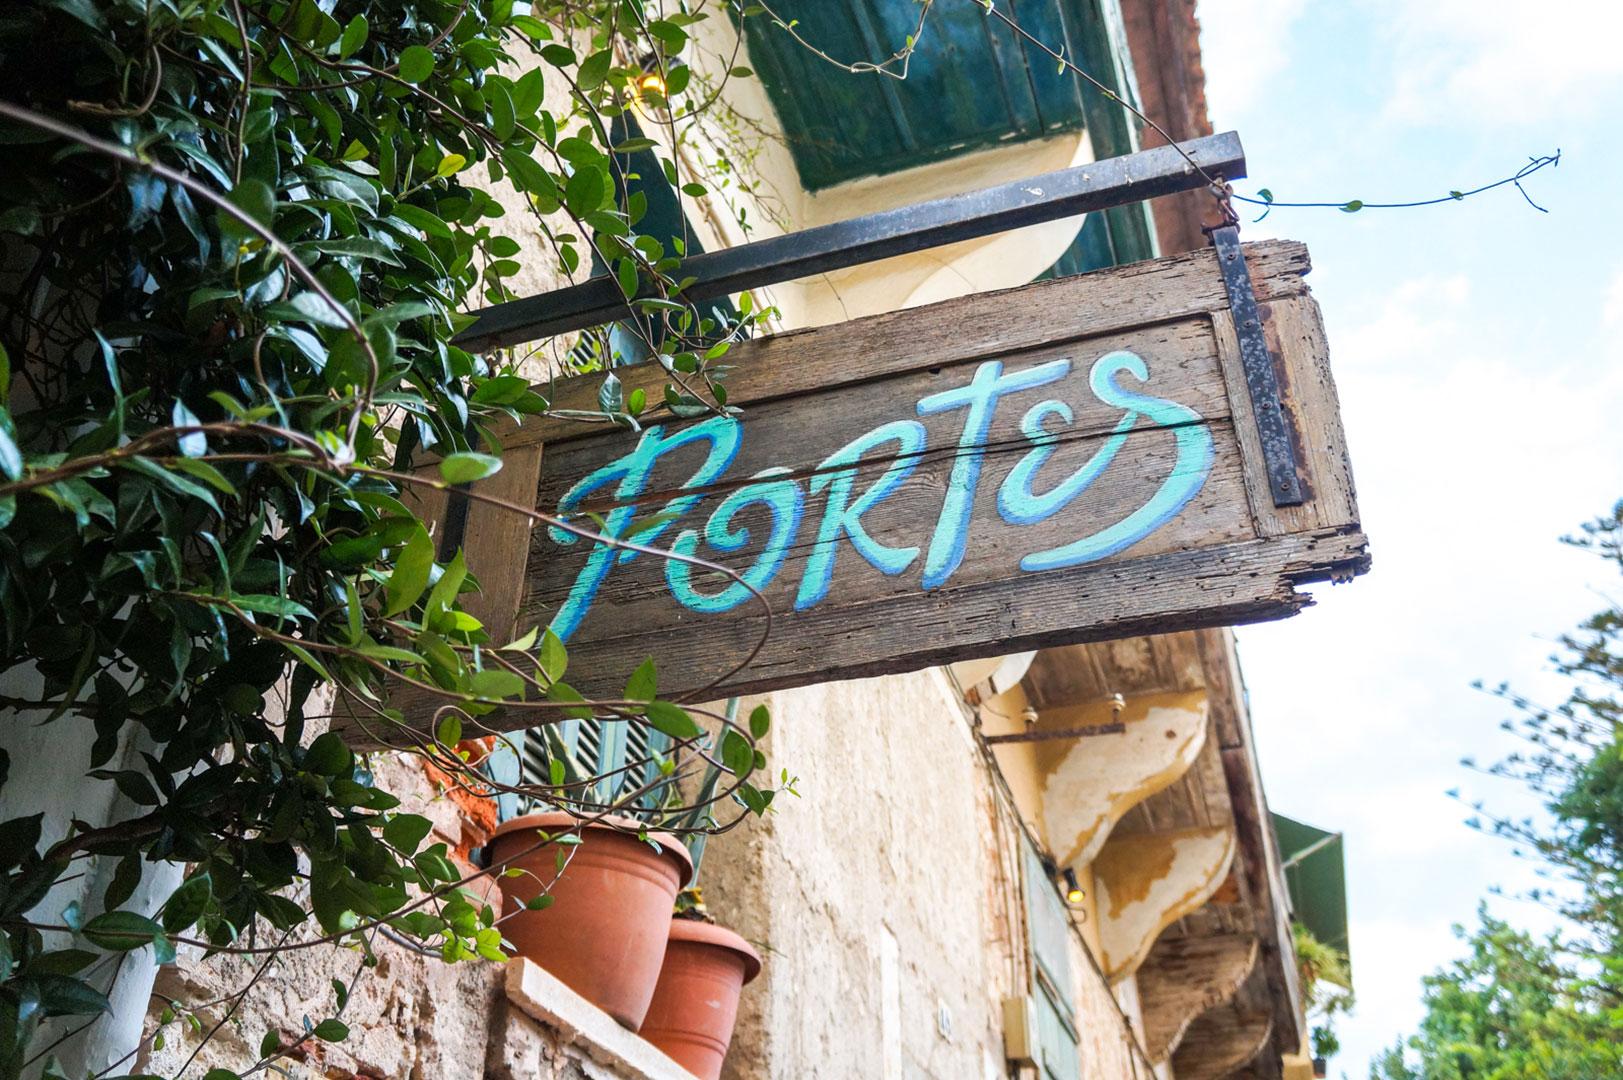 chania-crete-greece-la-vie-en-blog-all-rights-reserved-12